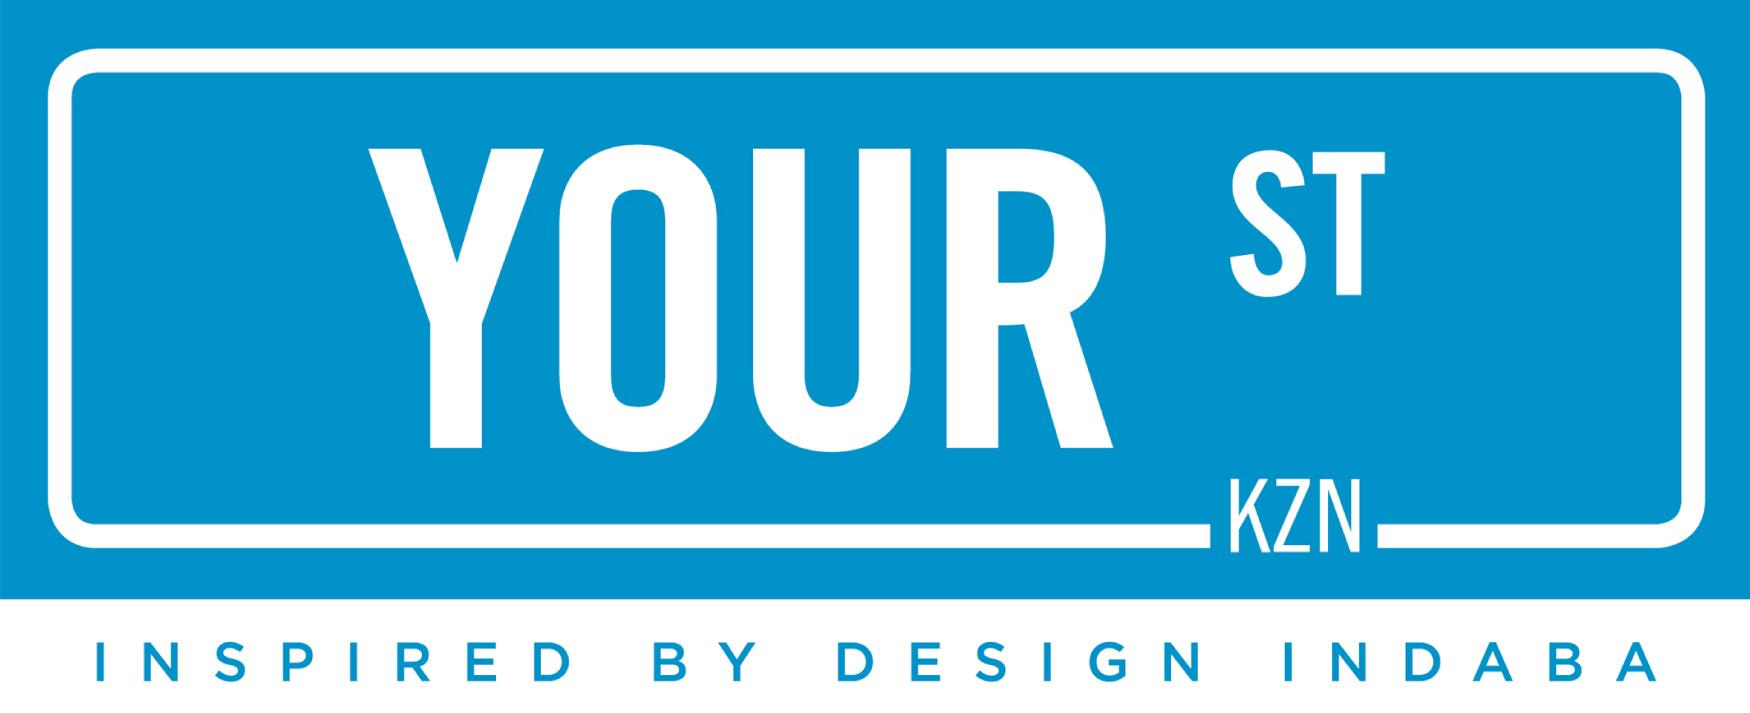 your street challenge now in kzn design indaba